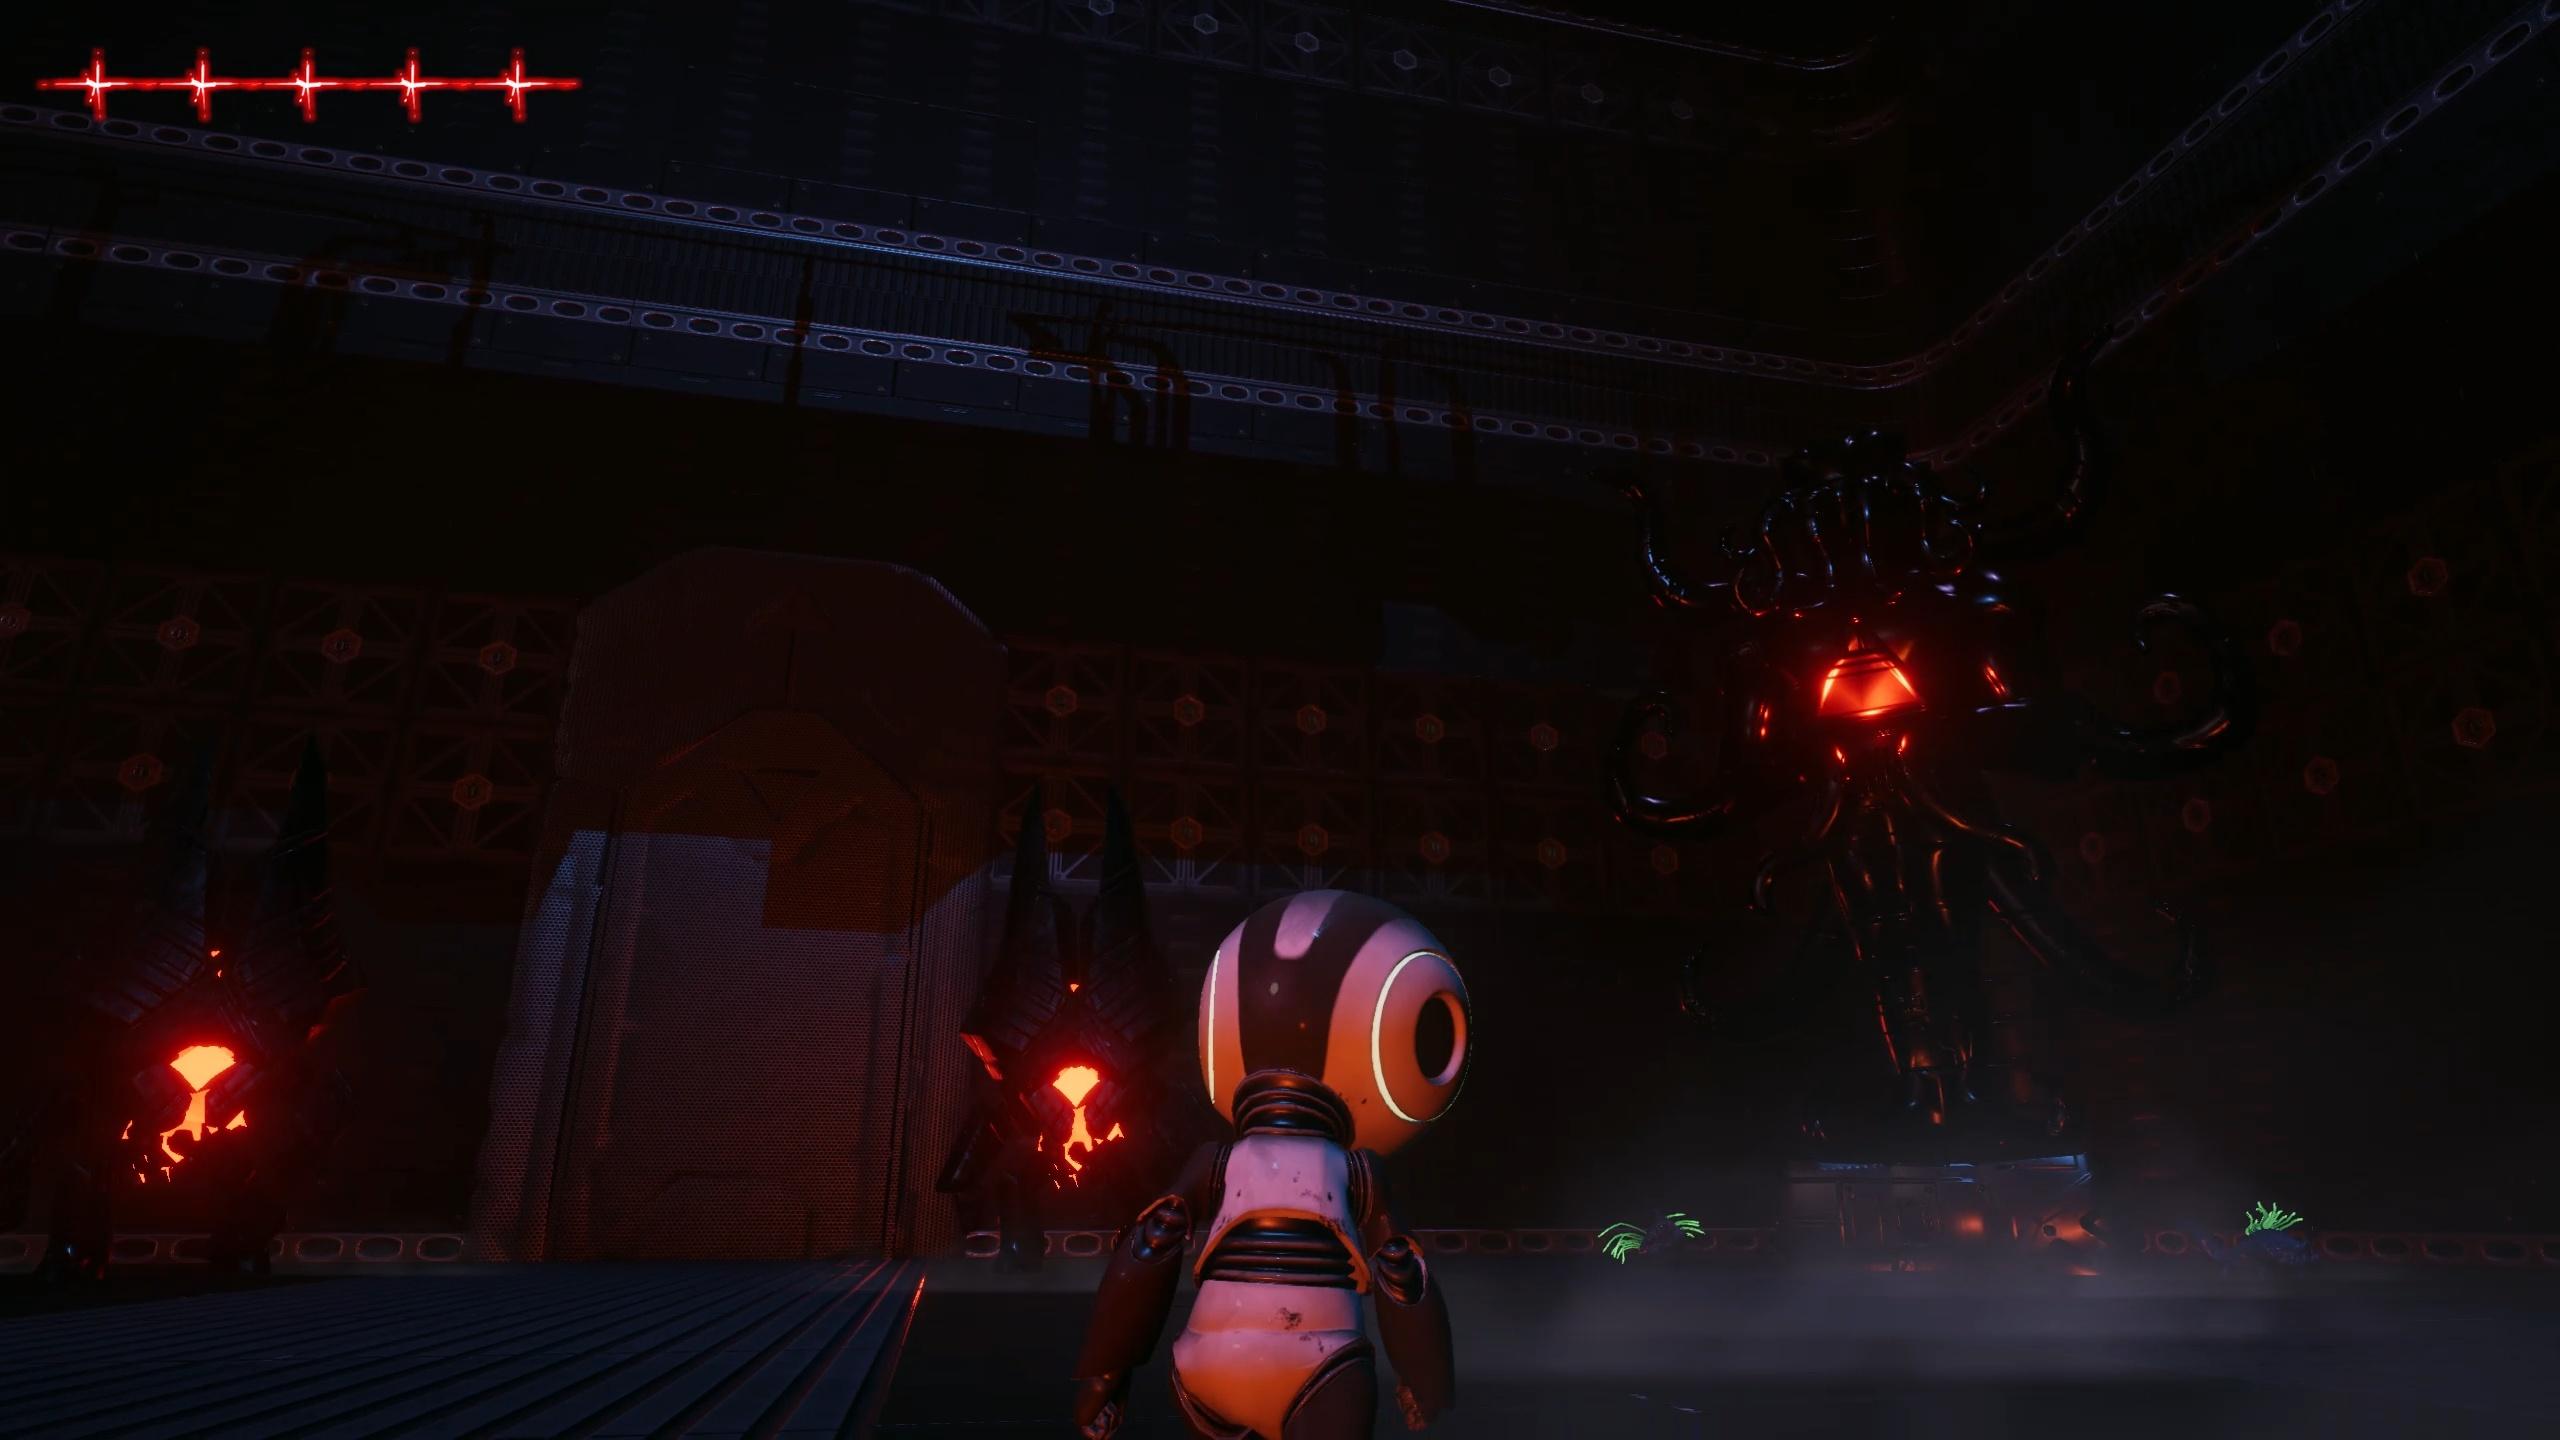 Screenshot from itch.io